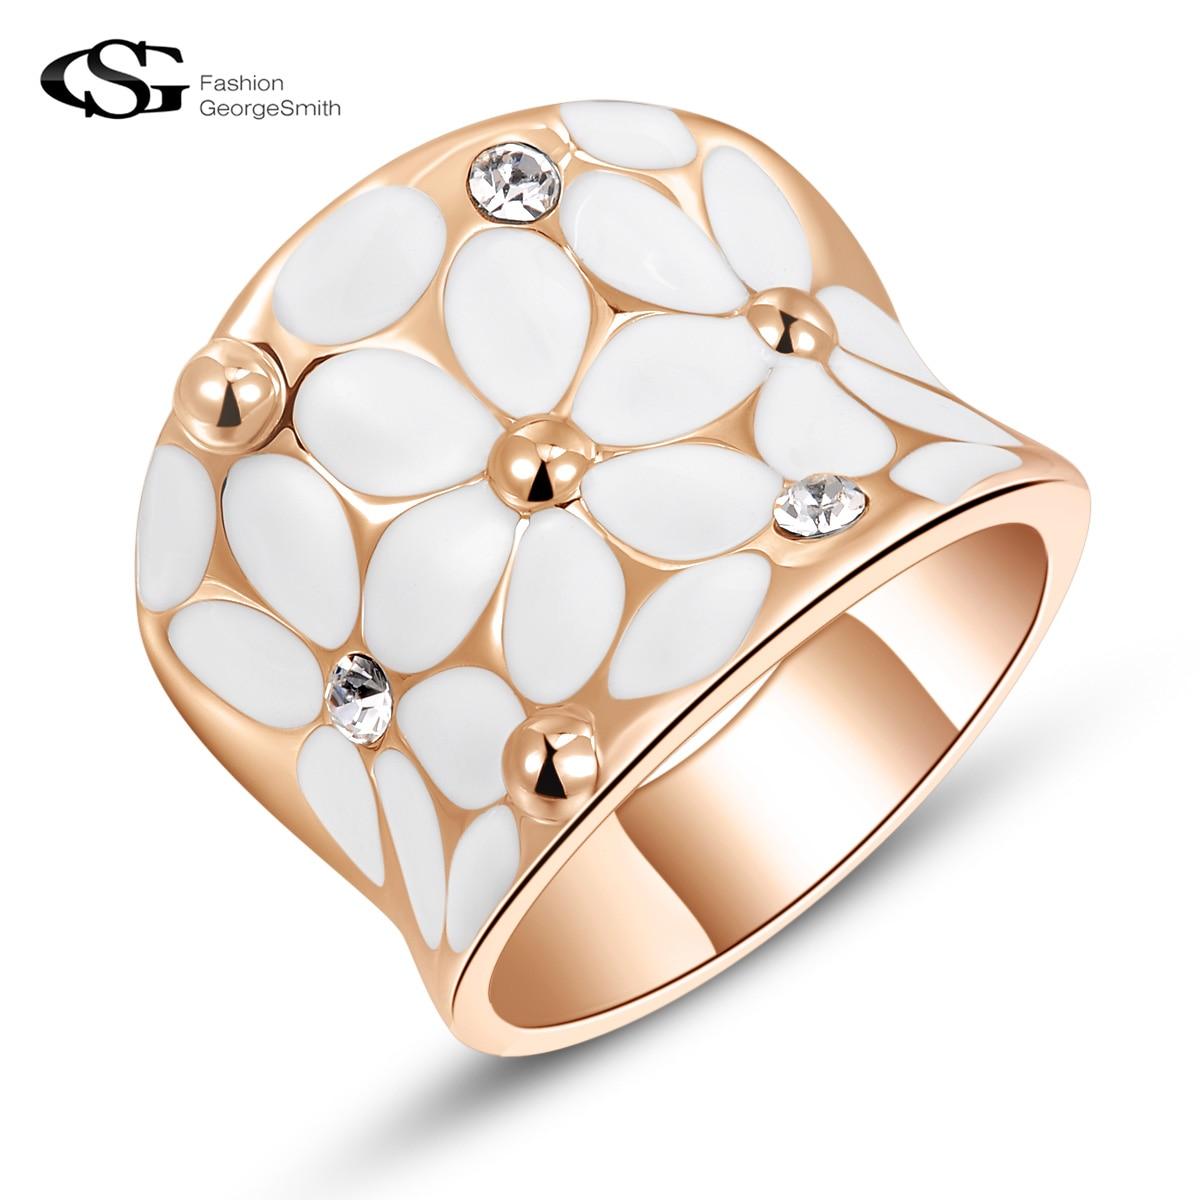 GS Elegant Women Rings